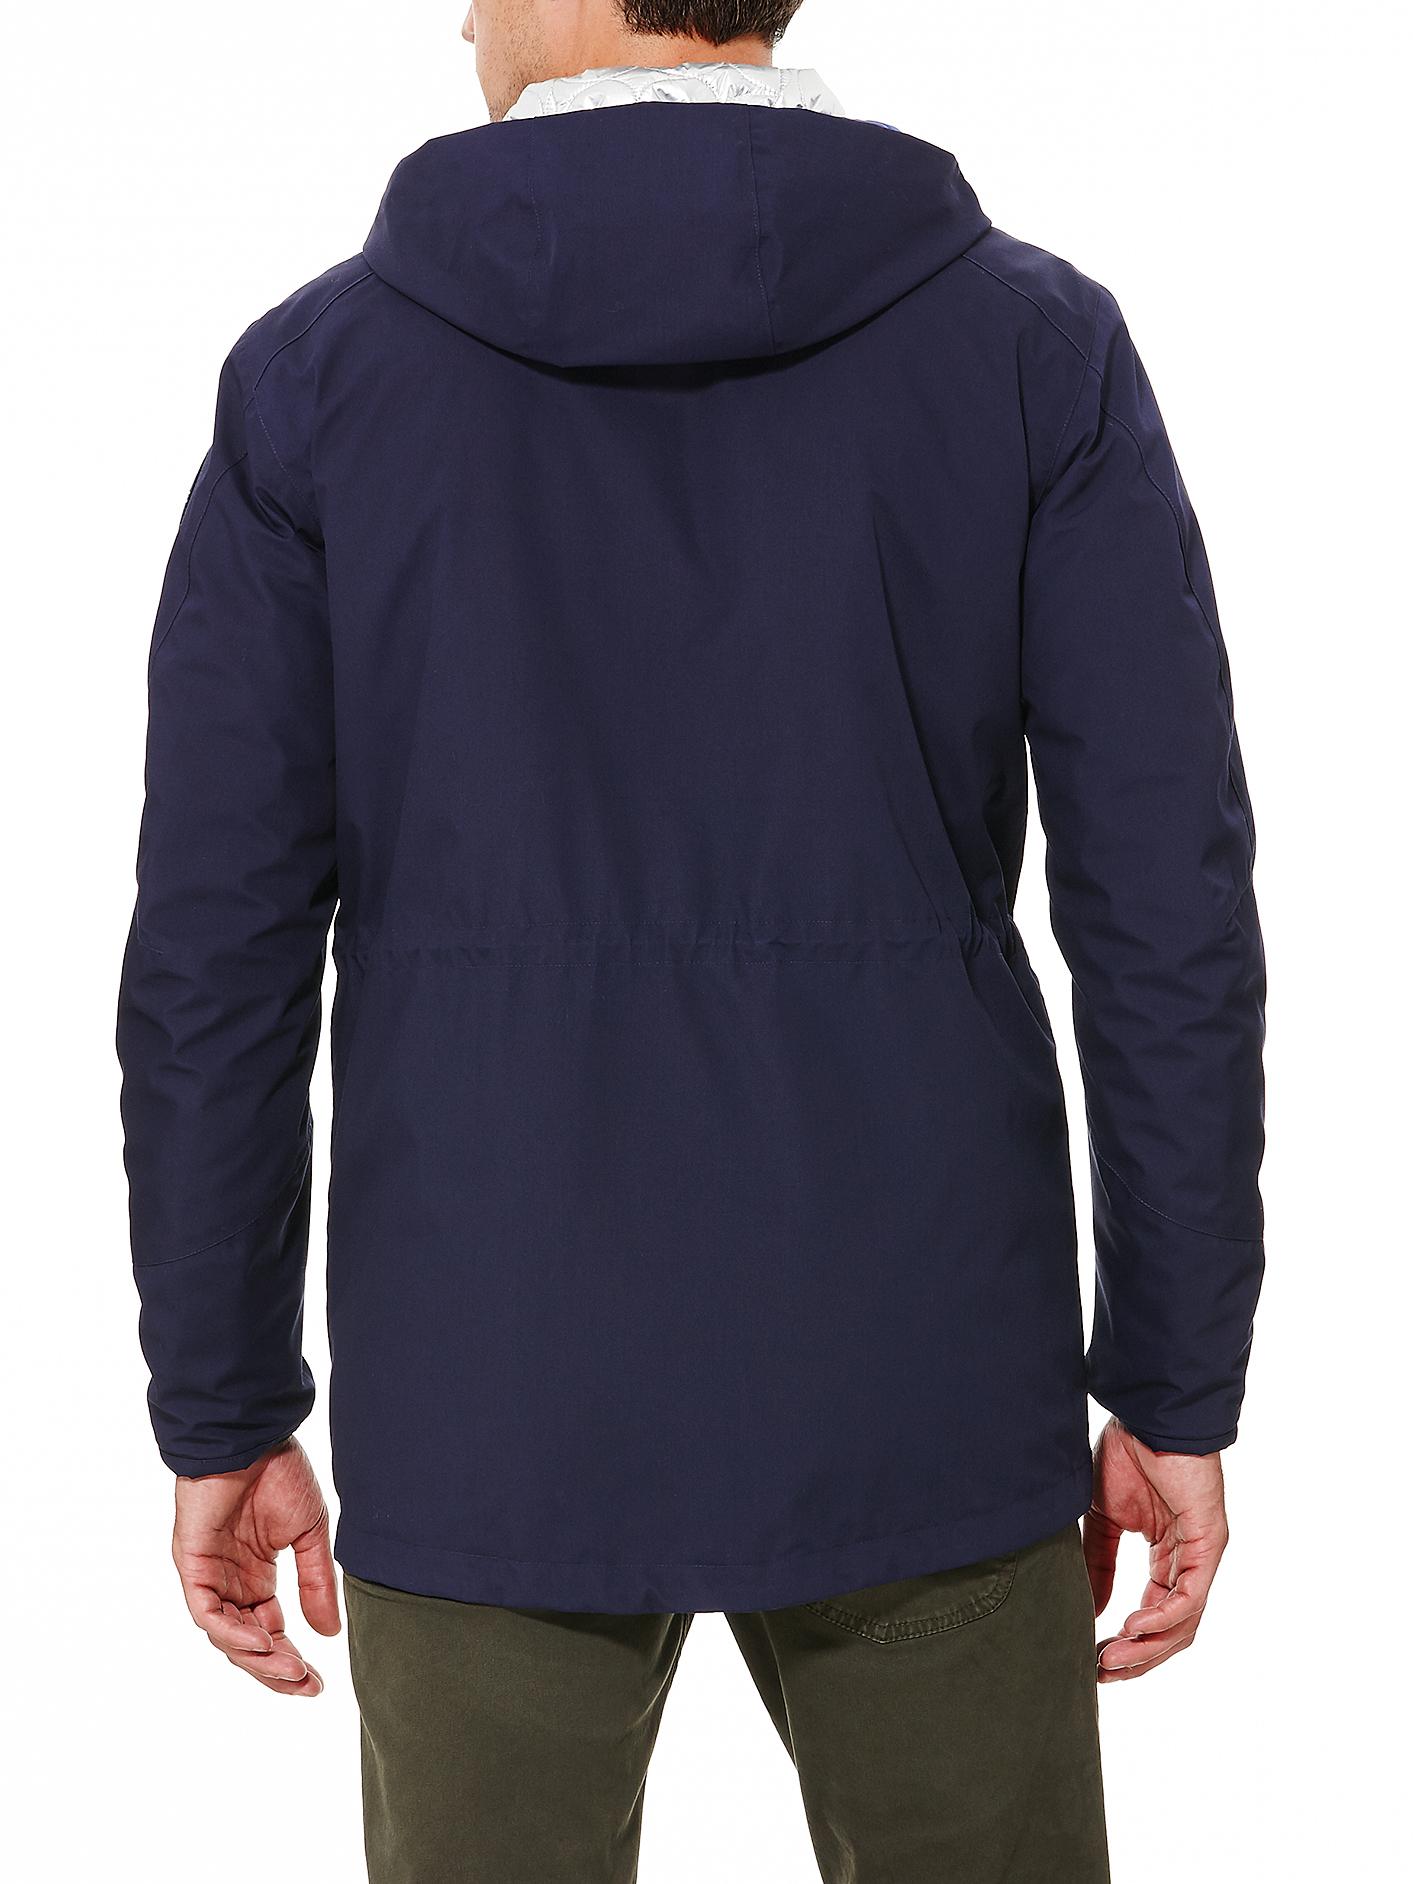 jacket kellys jackets coats sails collection